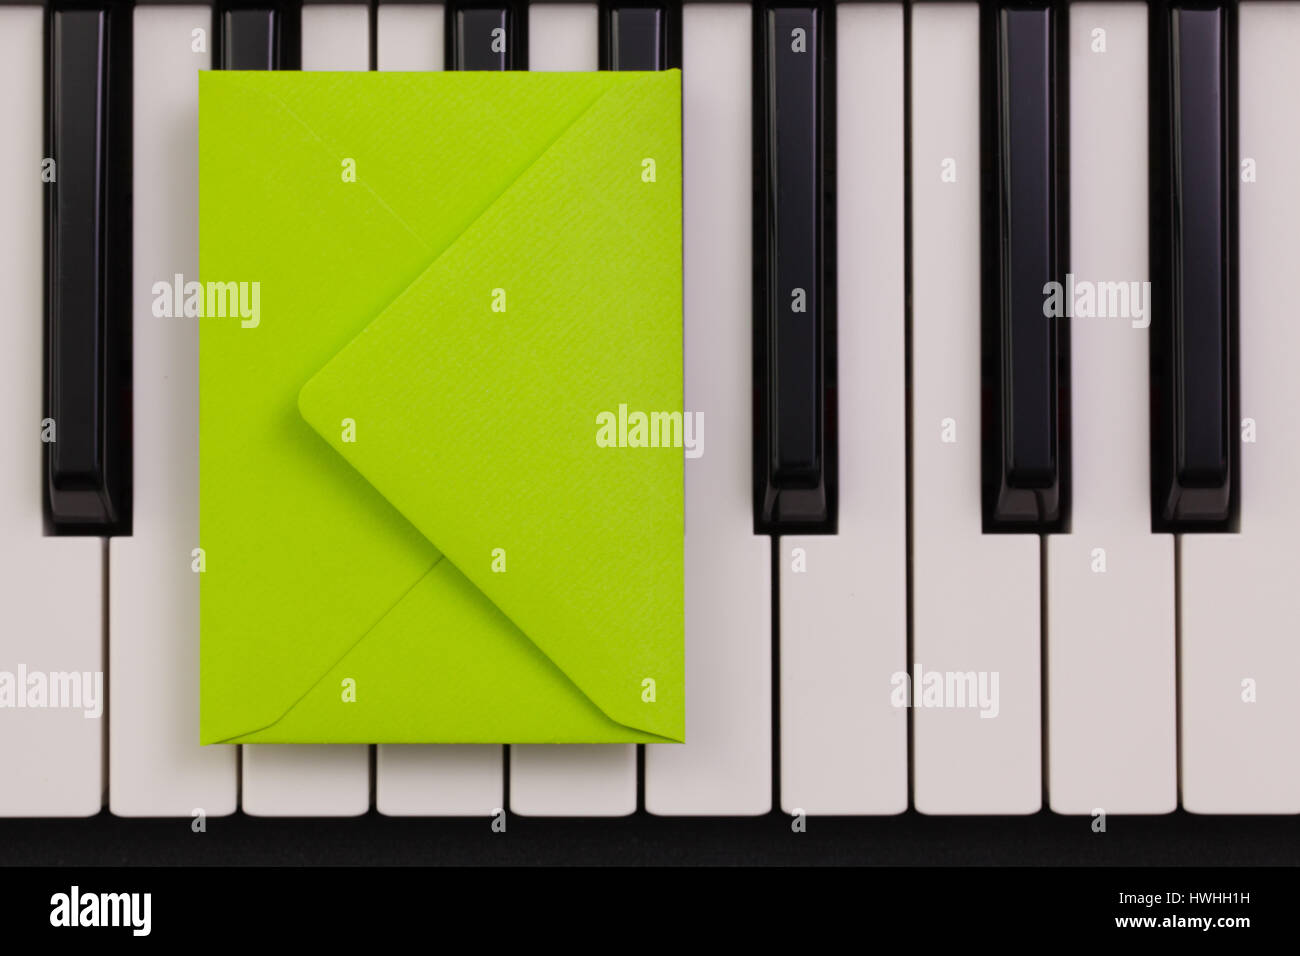 Funny arrangement envelope on the piano keybords - Flat lay image - Stock Image